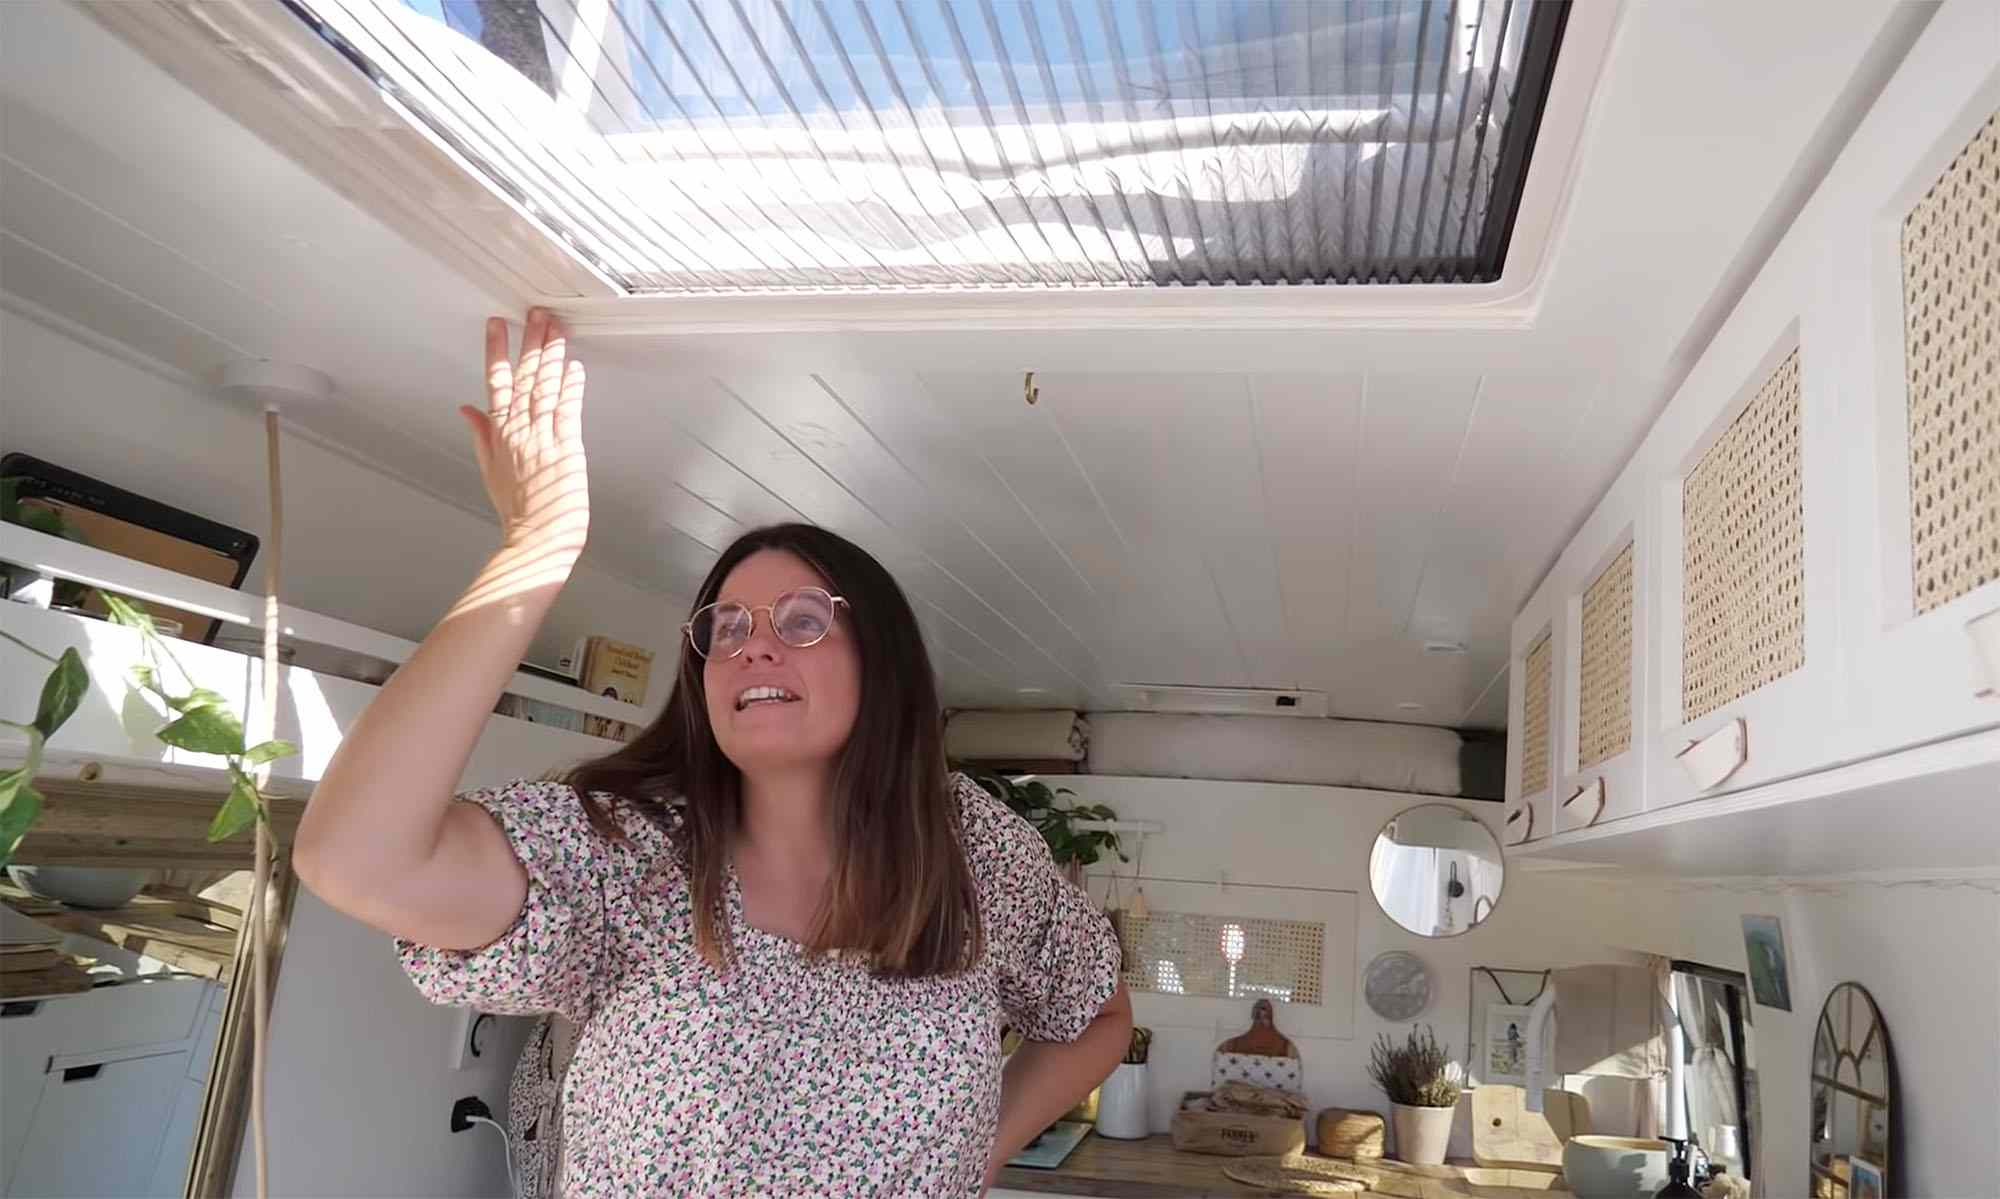 Julieta van conversion skylight